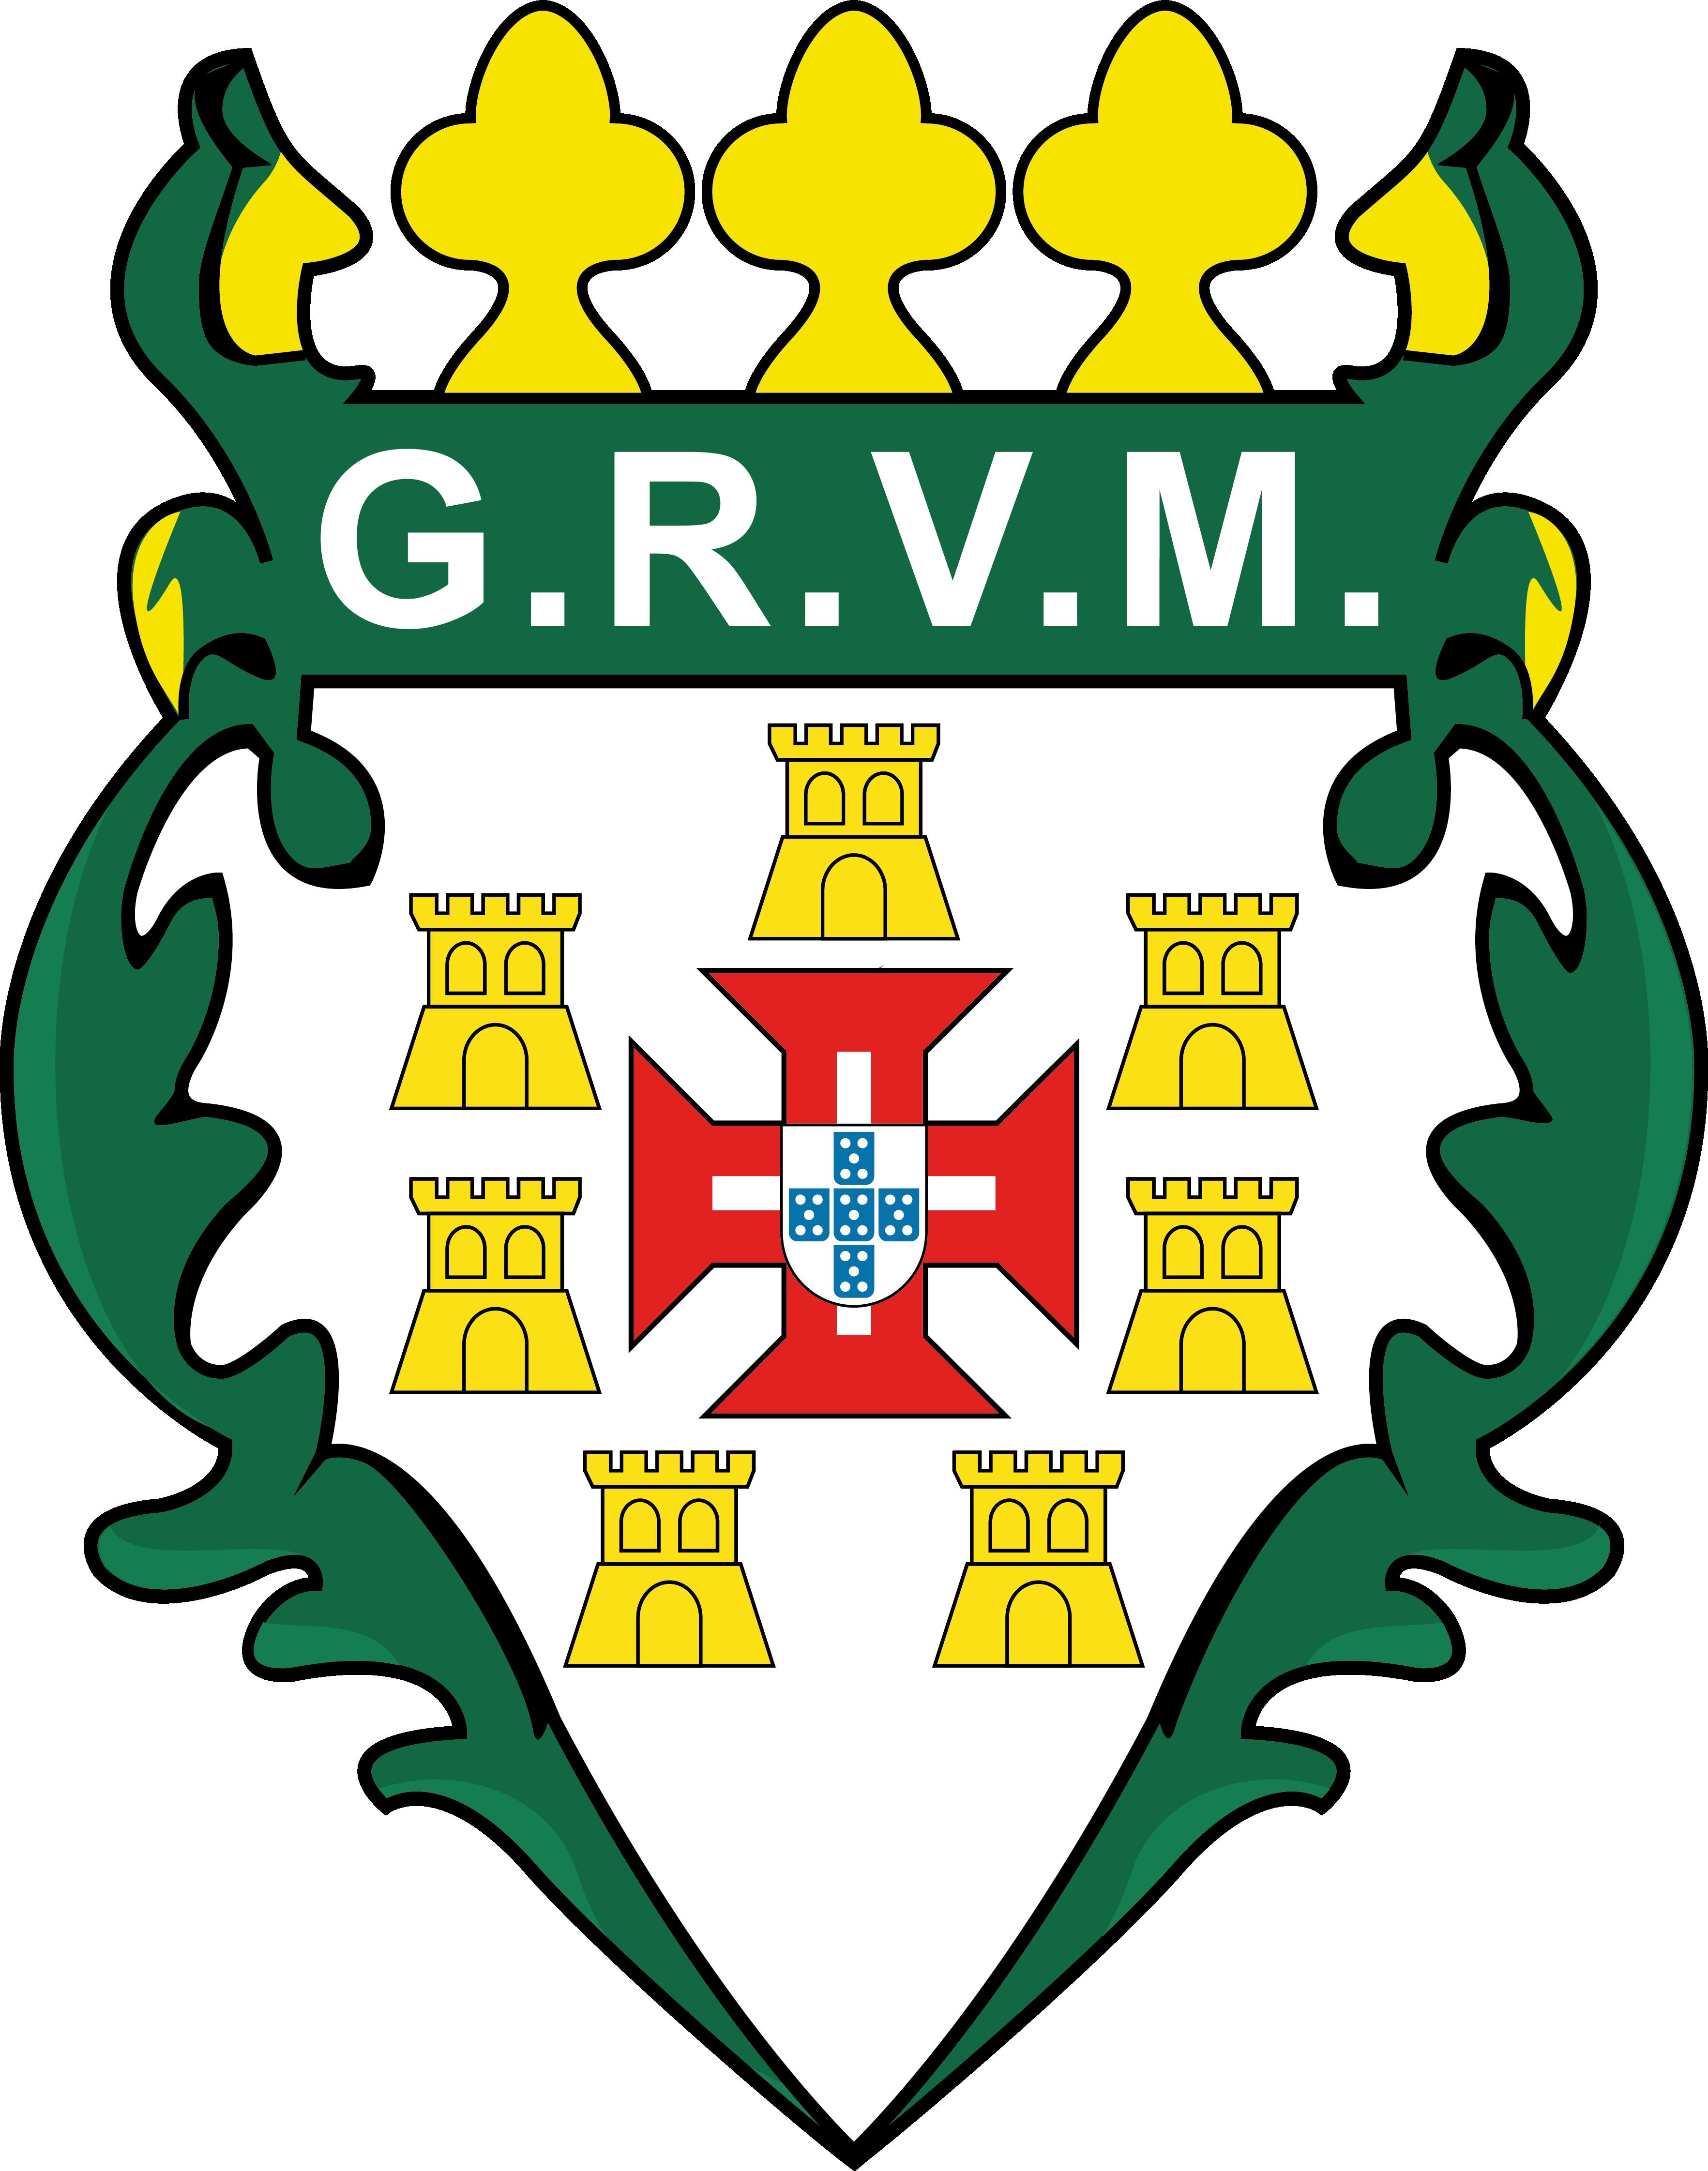 G R Vigor E Mocidade P Futebol Escudos De Futebol Mocidade